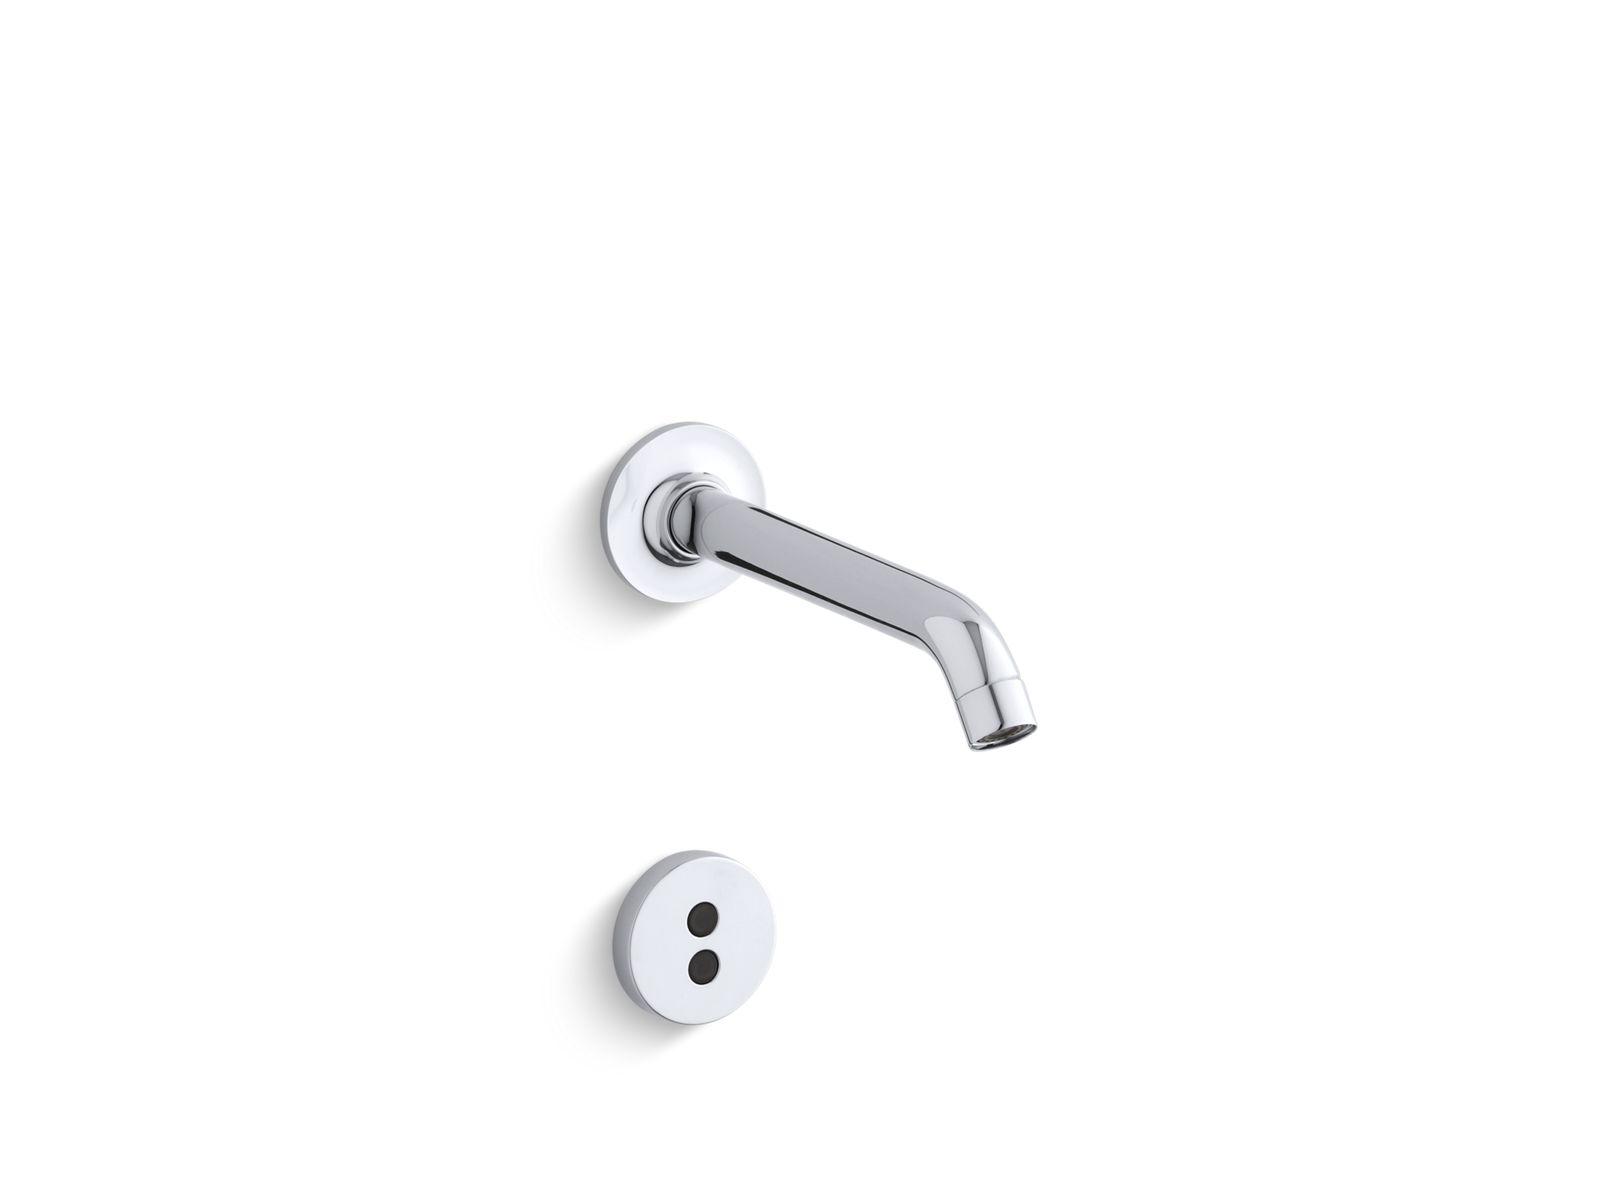 K T11840 Purist Wall Mount Touchless Faucet Trim With 35 Degree Spout Kohler